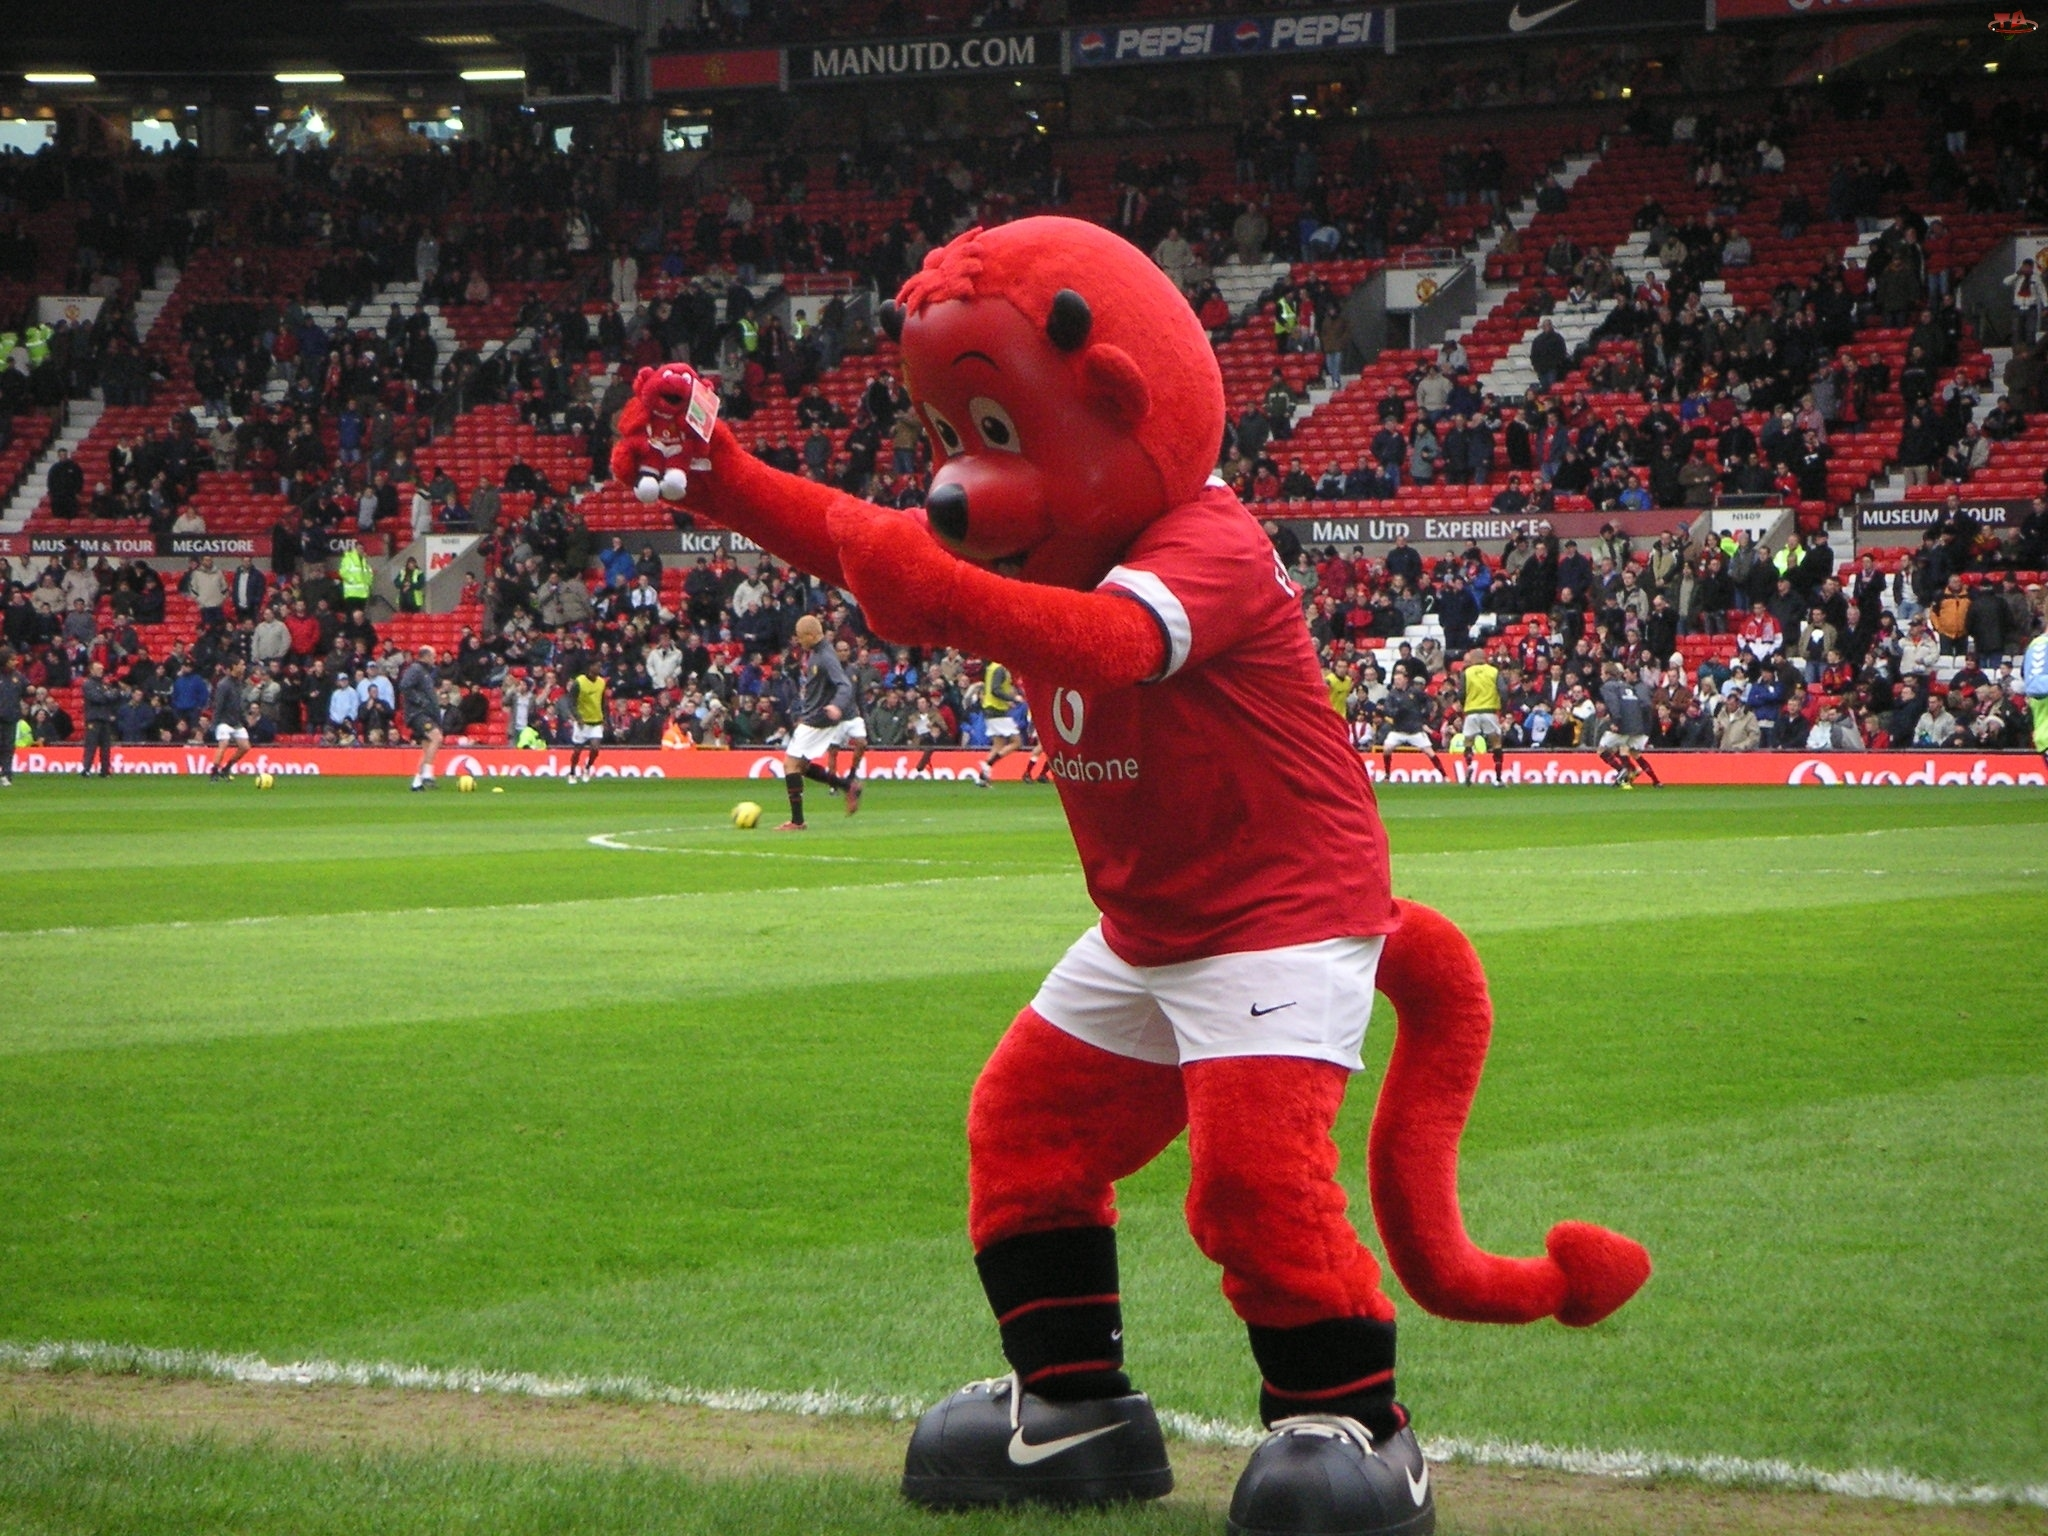 Maskotka, Manchester United, Czerwona